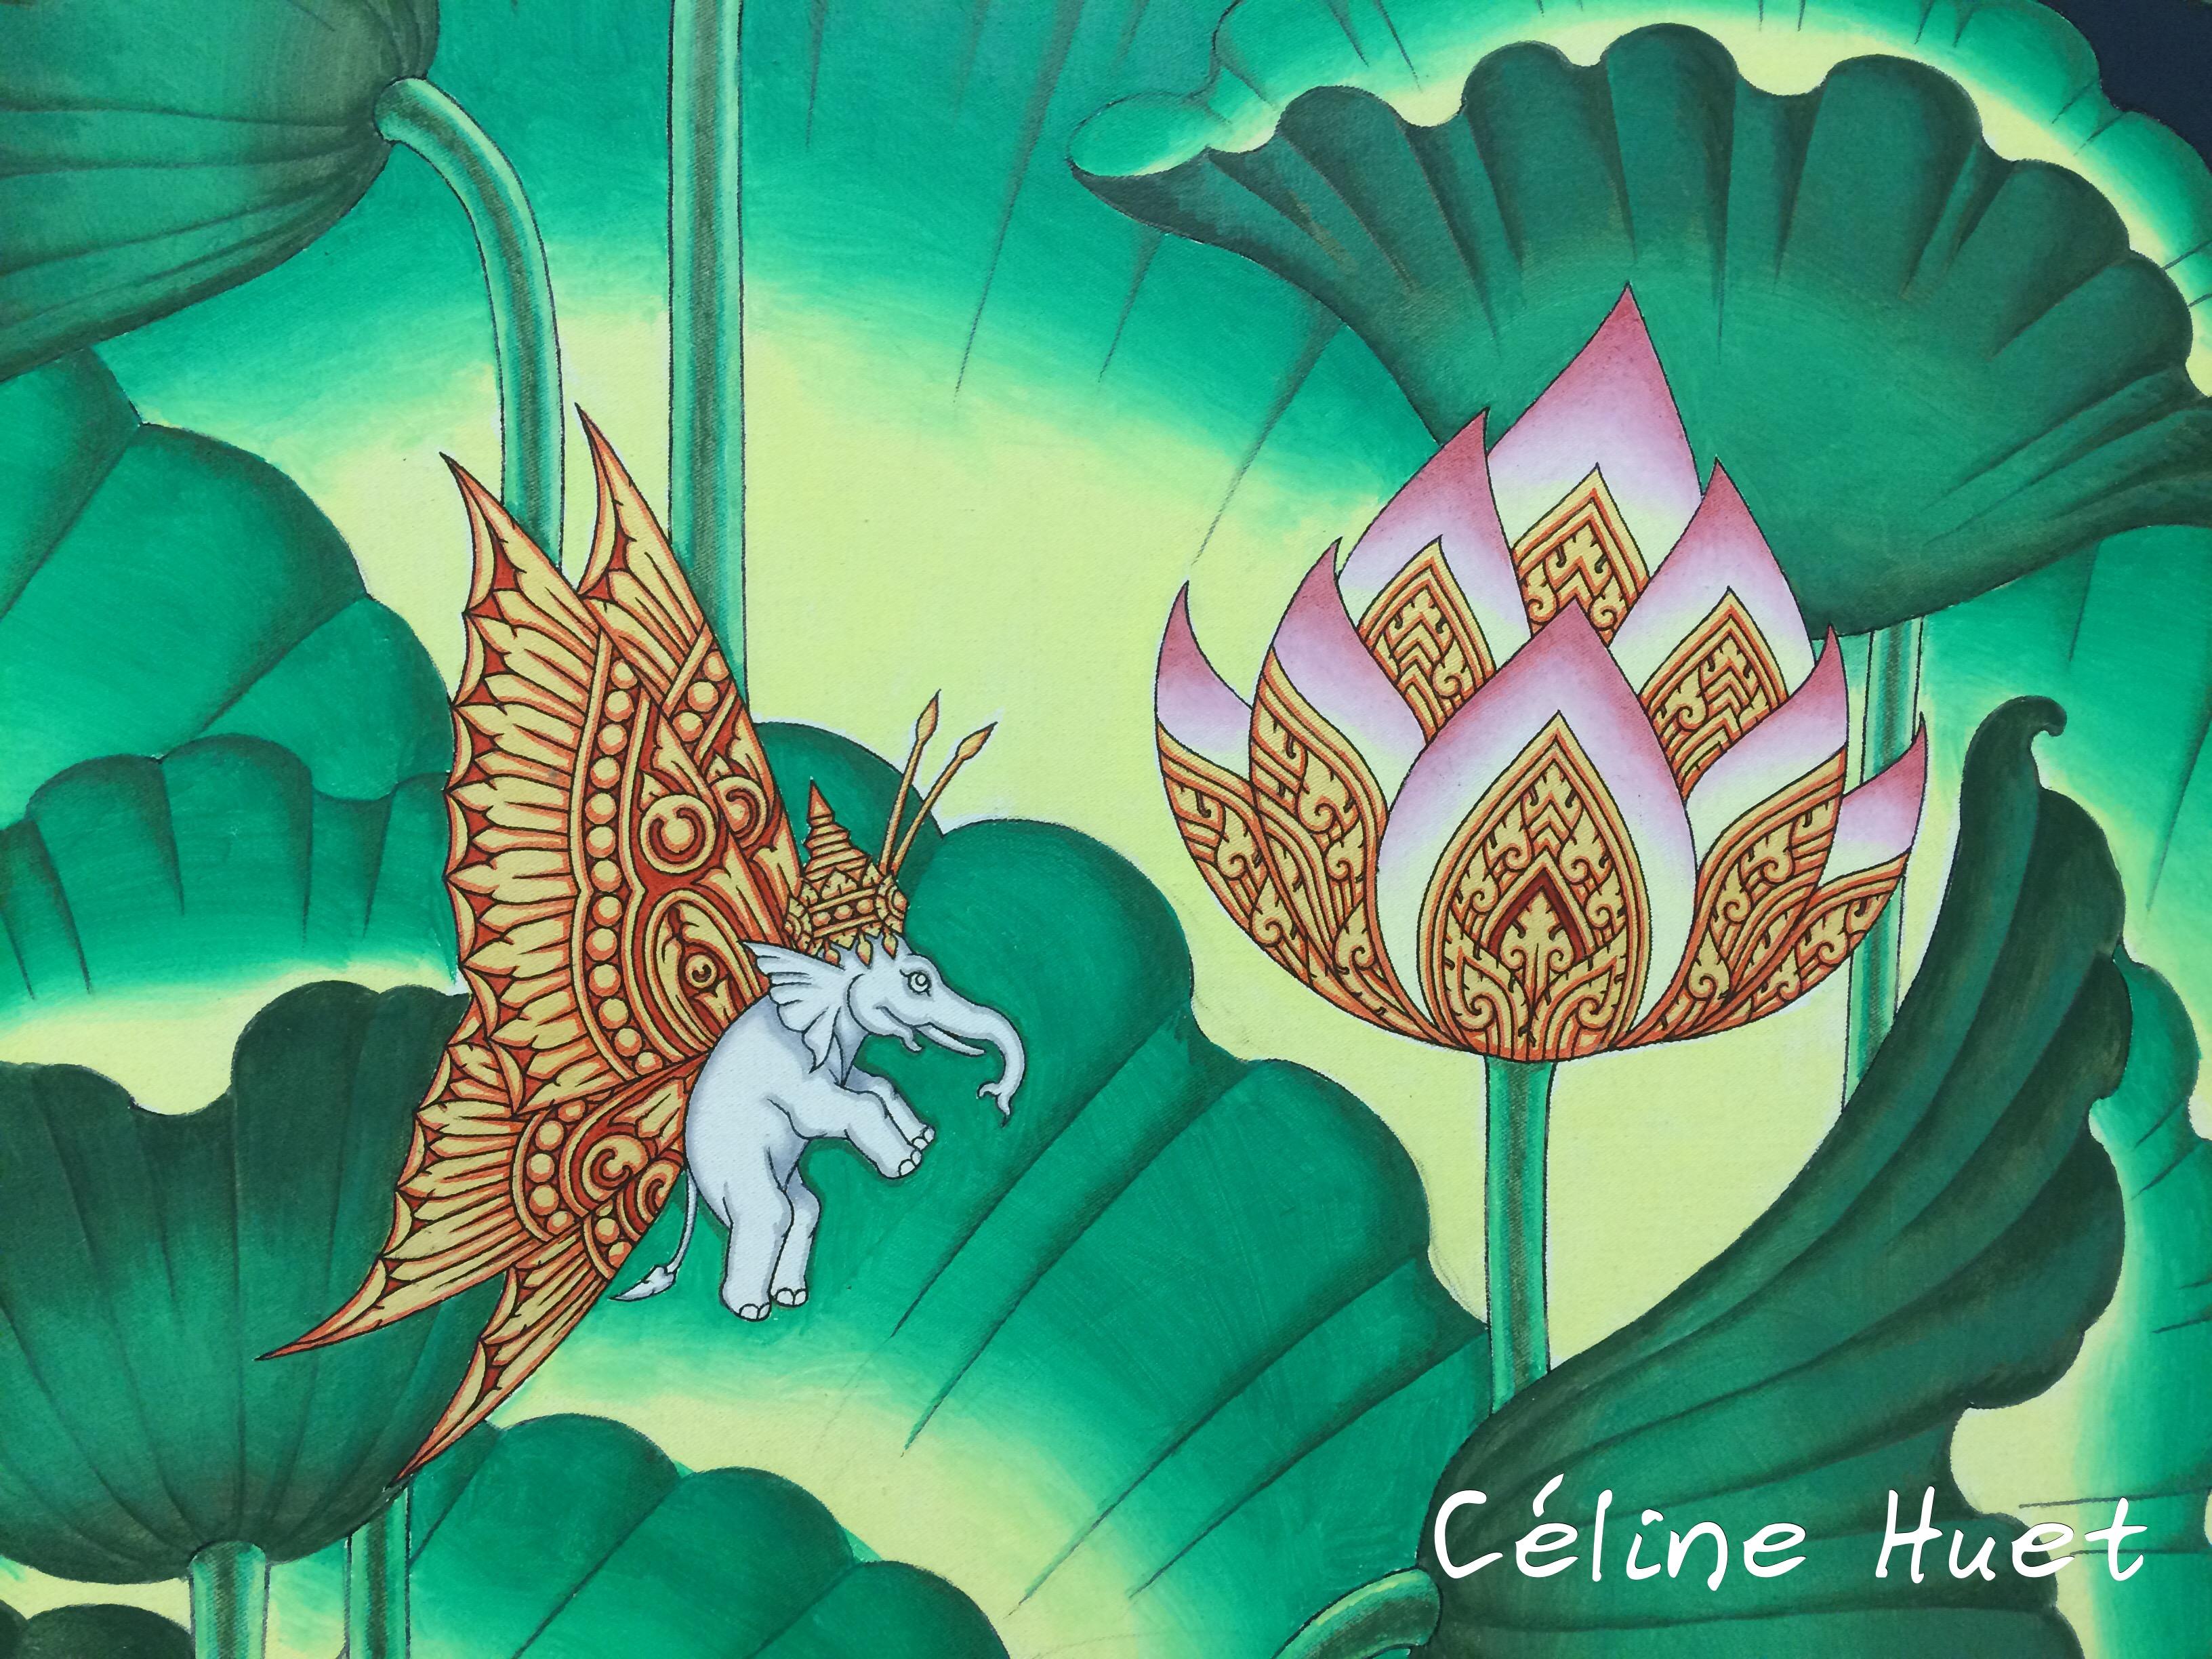 Legendary of Himmaphan Chuang Moonpinit MOCA Bangkok Thaïlande Asie